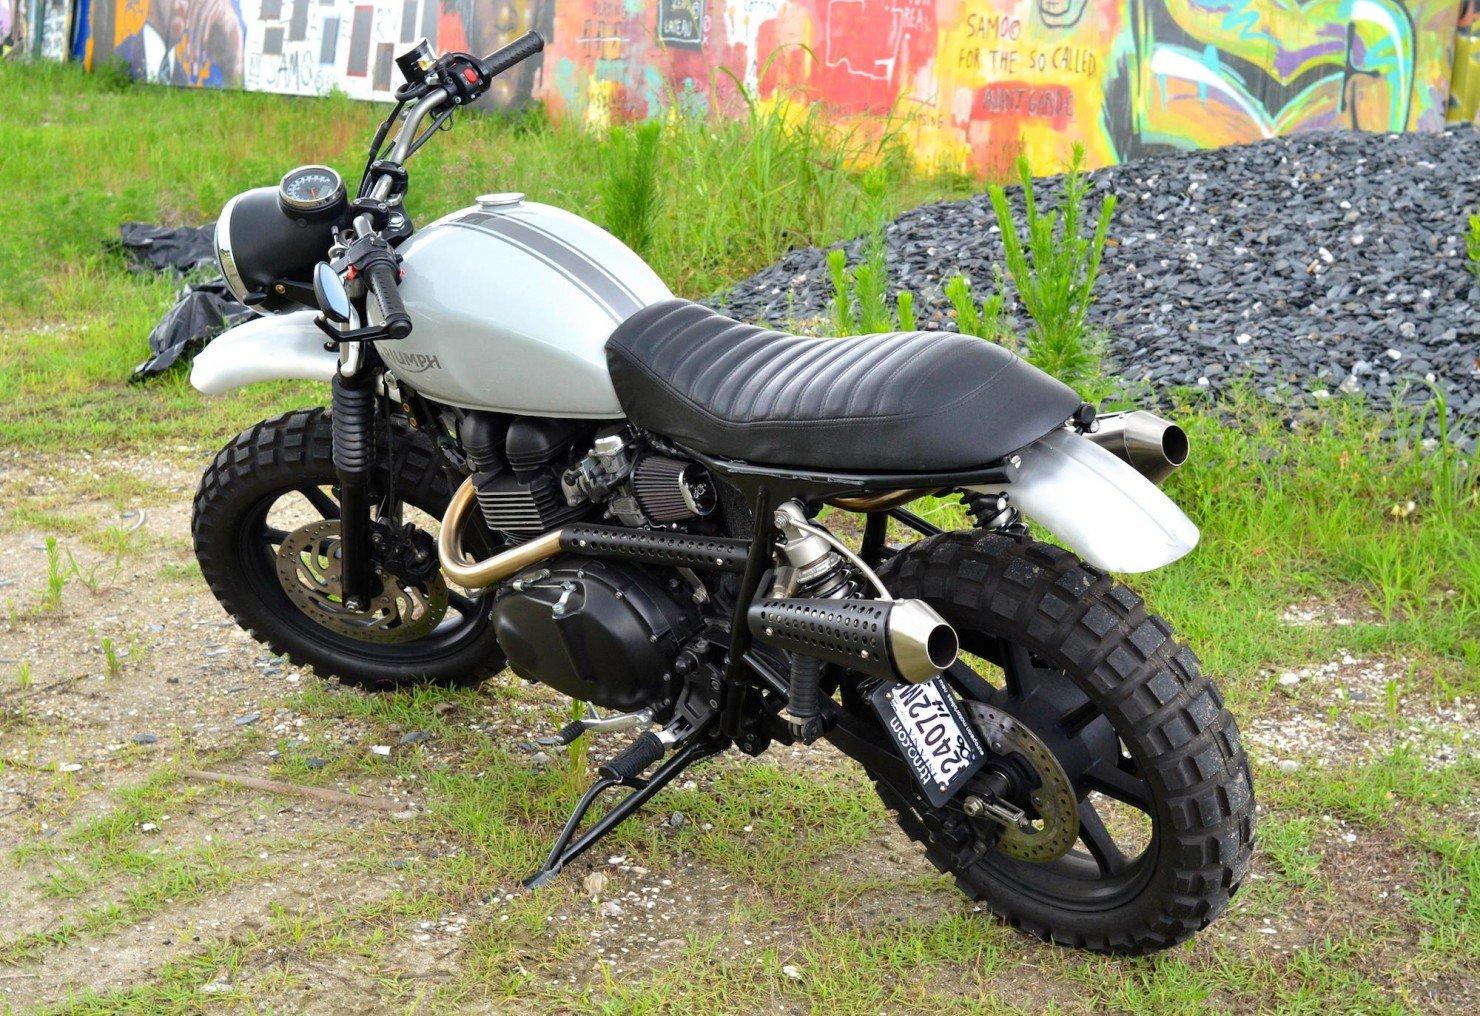 Triumph Scrambler Motorcycle 2